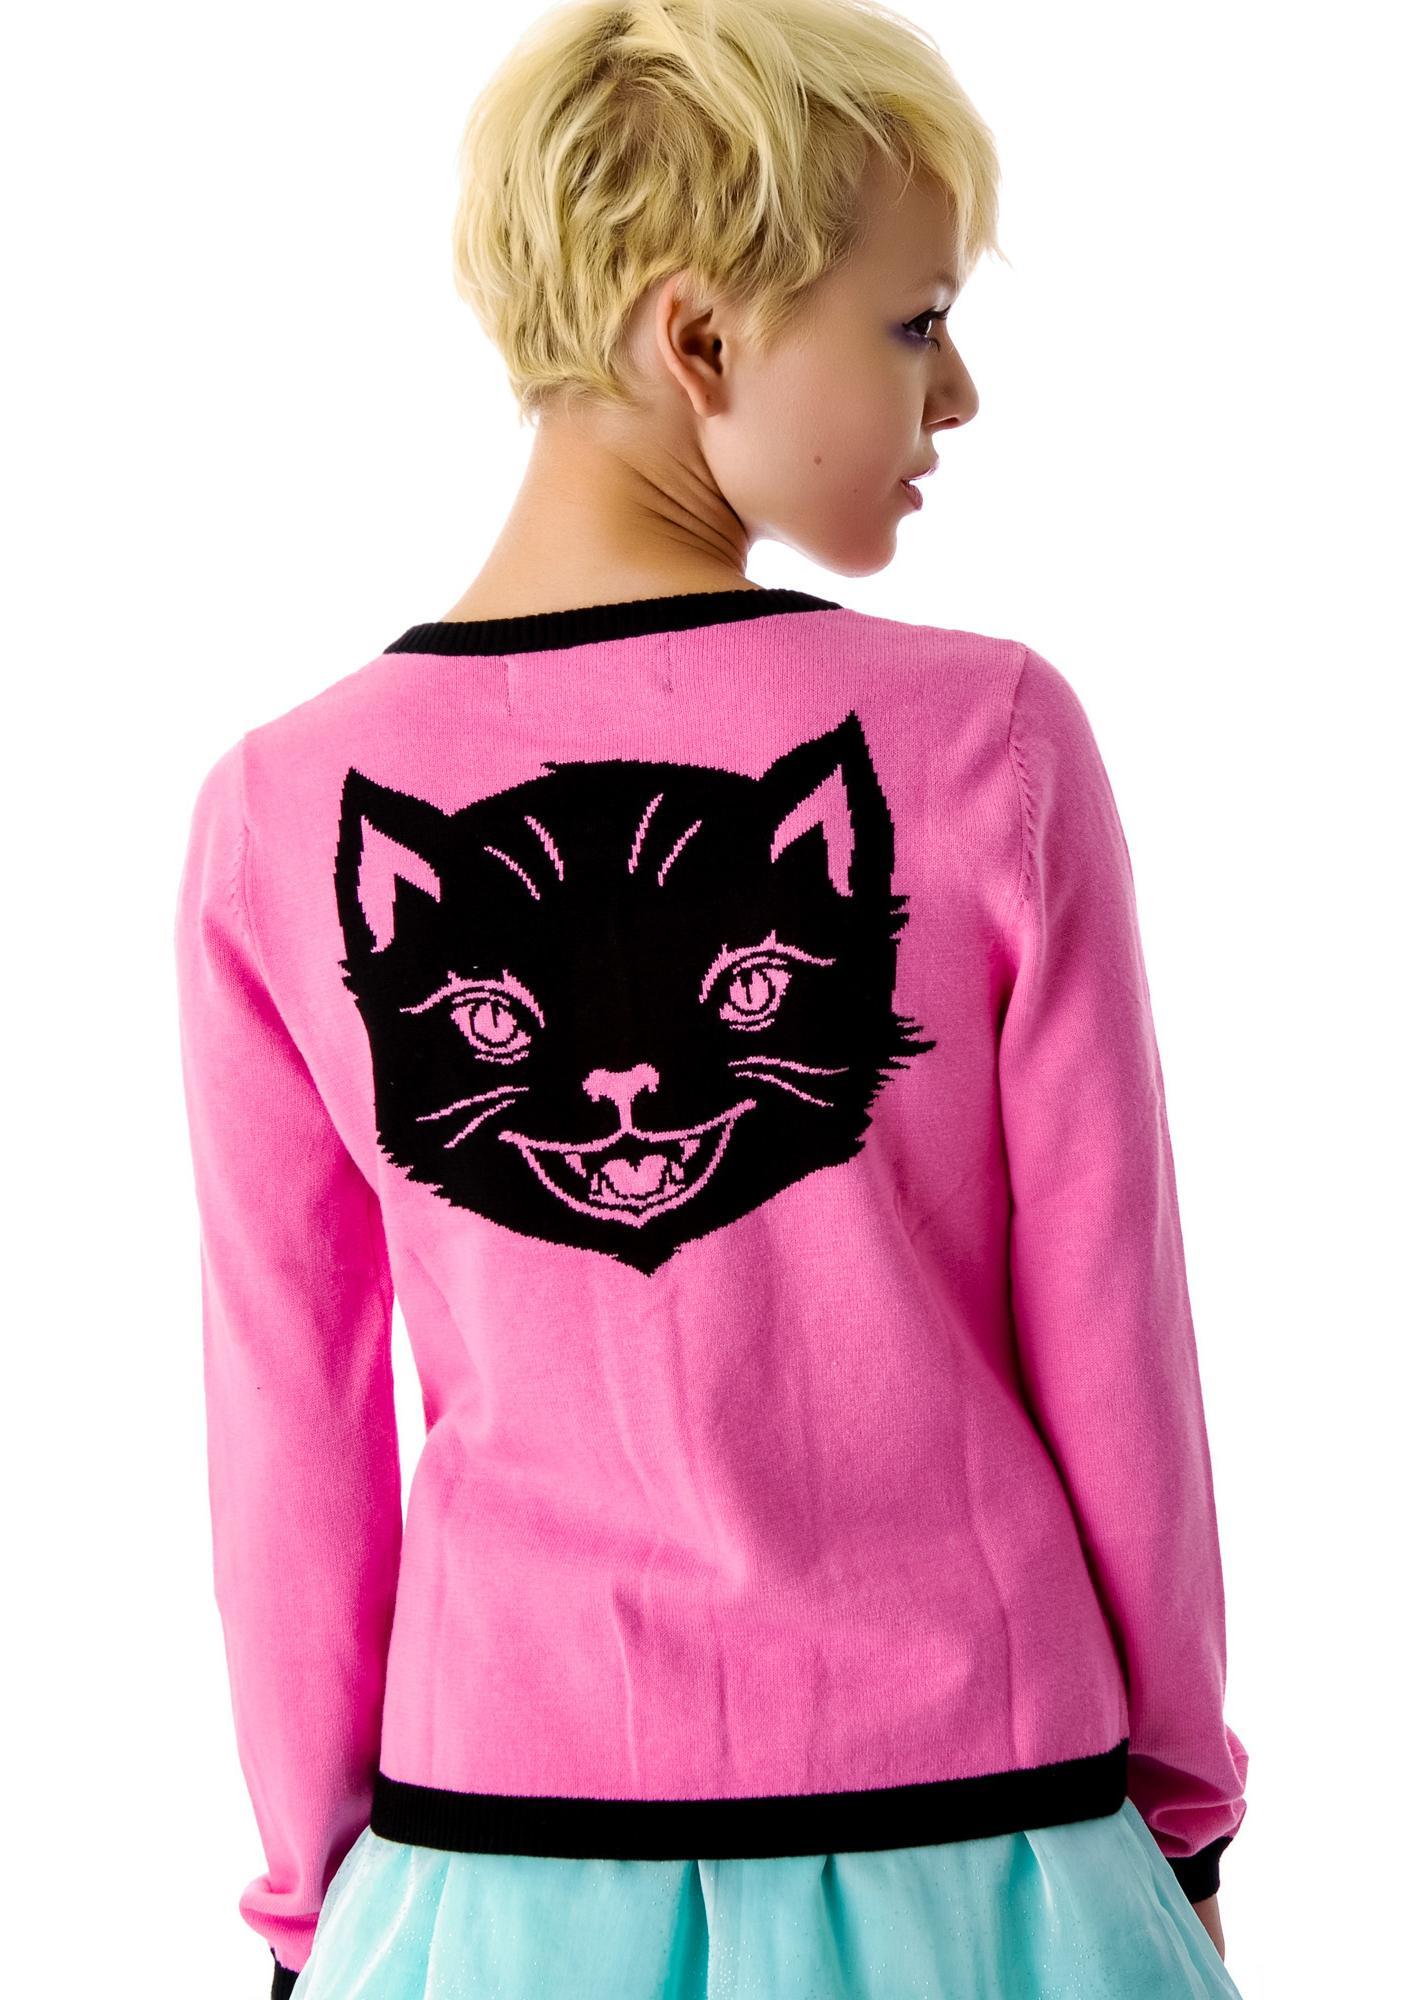 Sourpuss Clothing Hey Kitten Cardigan